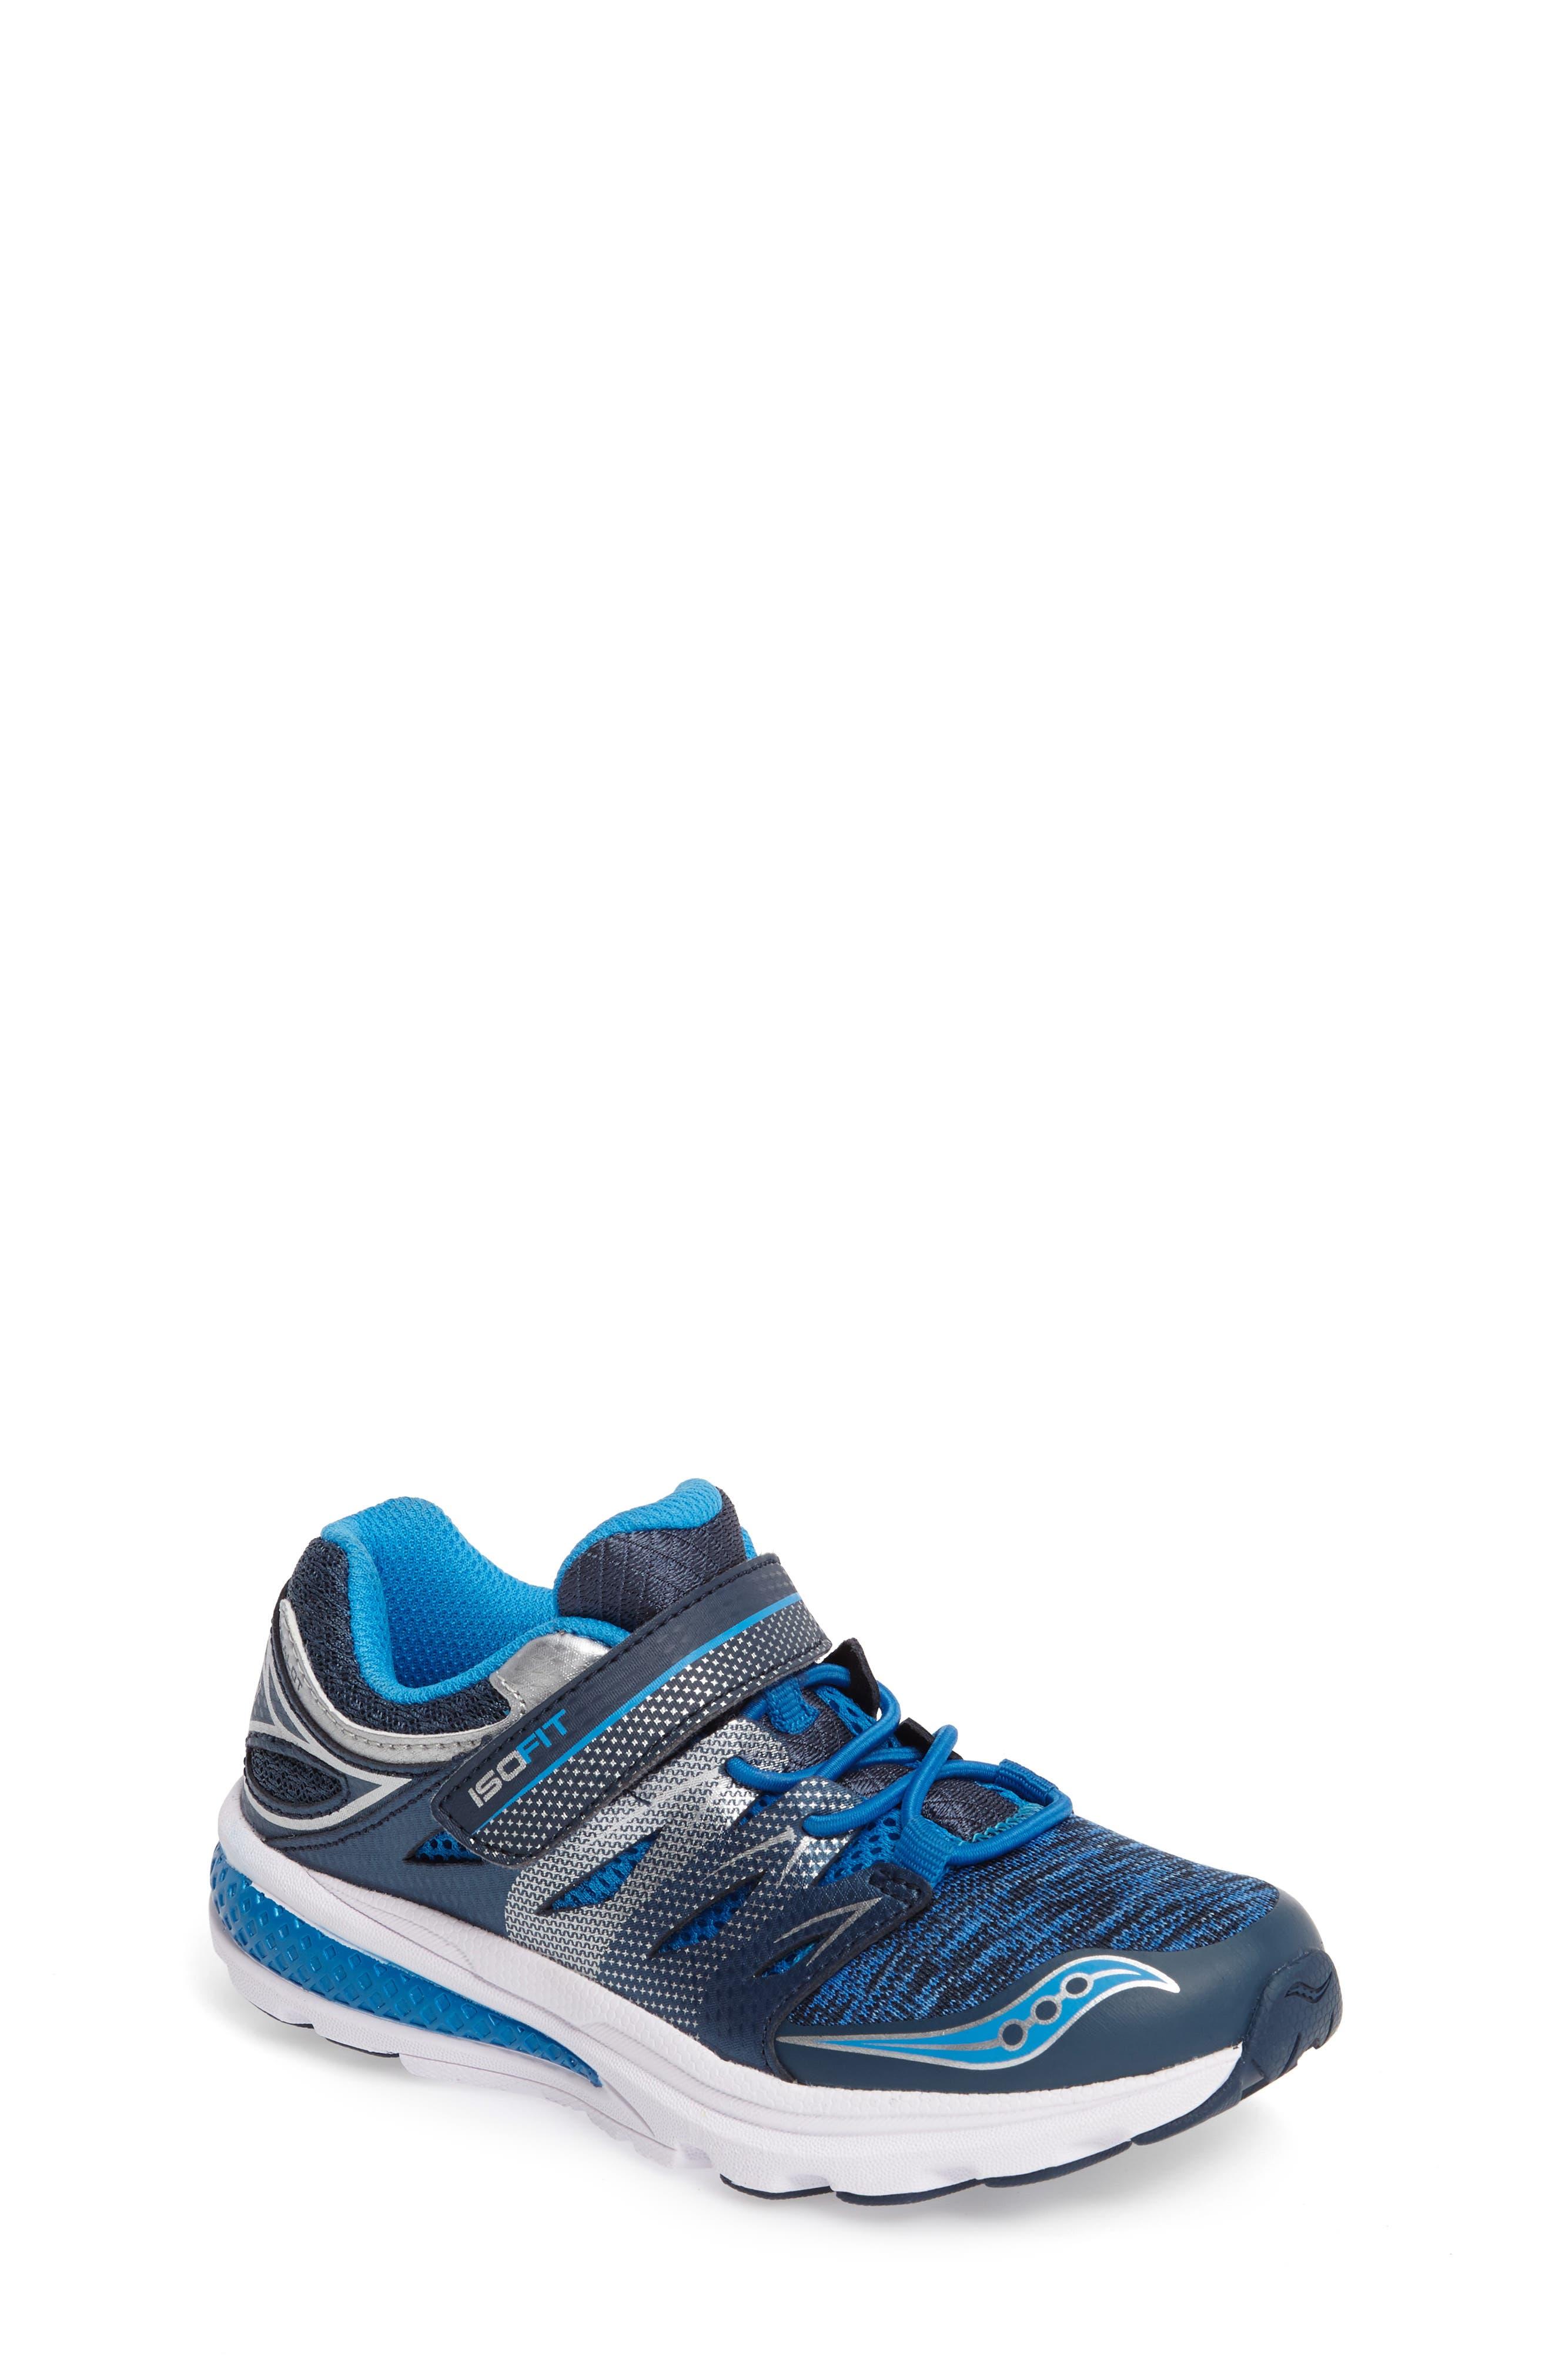 Zealot 2 A/C Sneaker,                         Main,                         color, Royal/ Navy